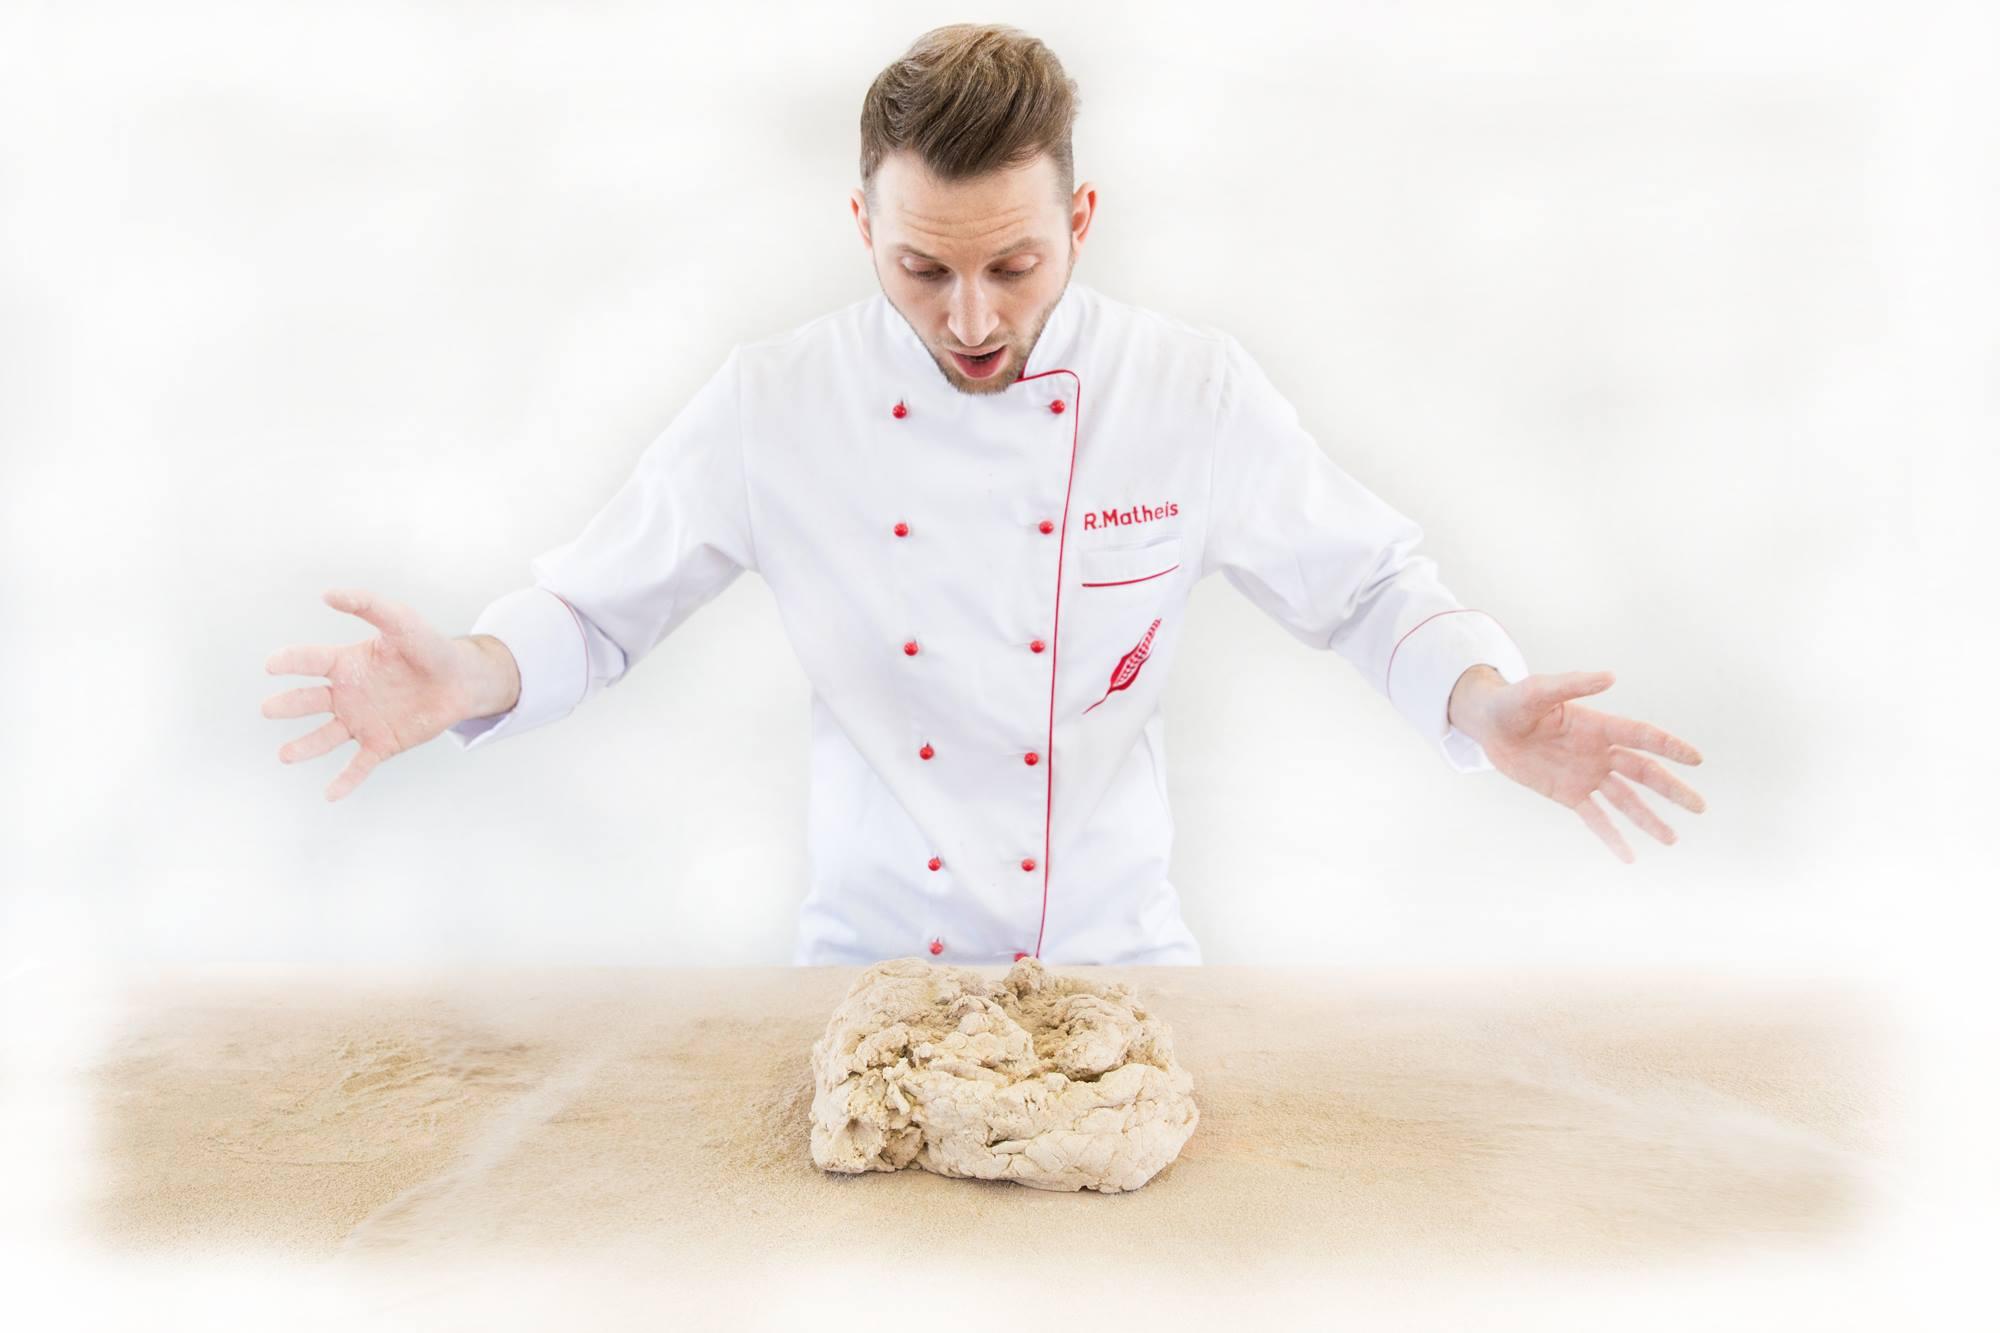 Rob-Teig-Tisch-Maisterei